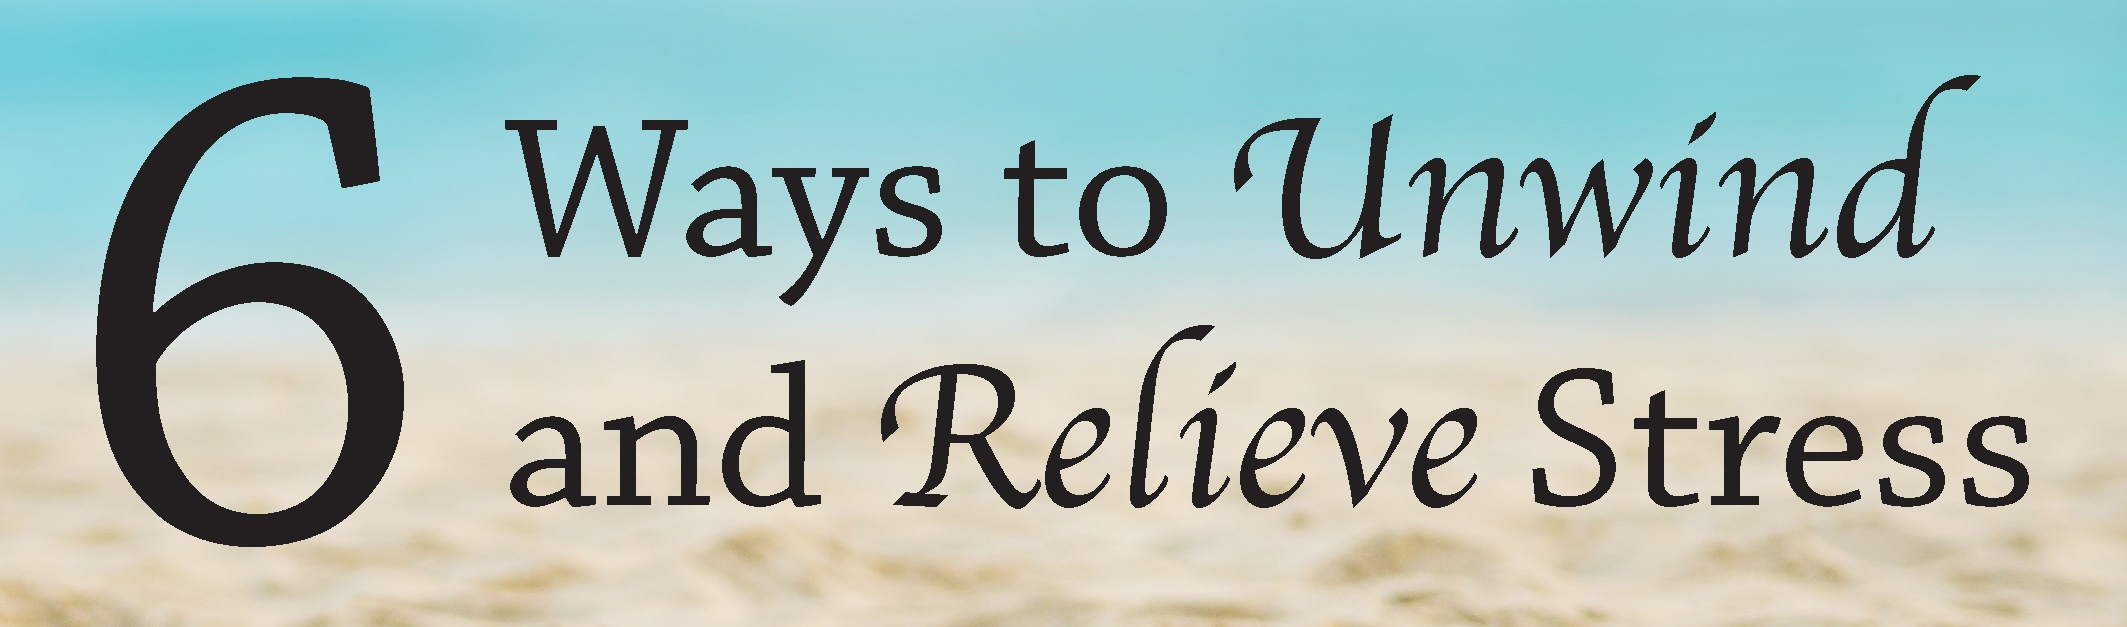 6 ways to unwind and relieve stress